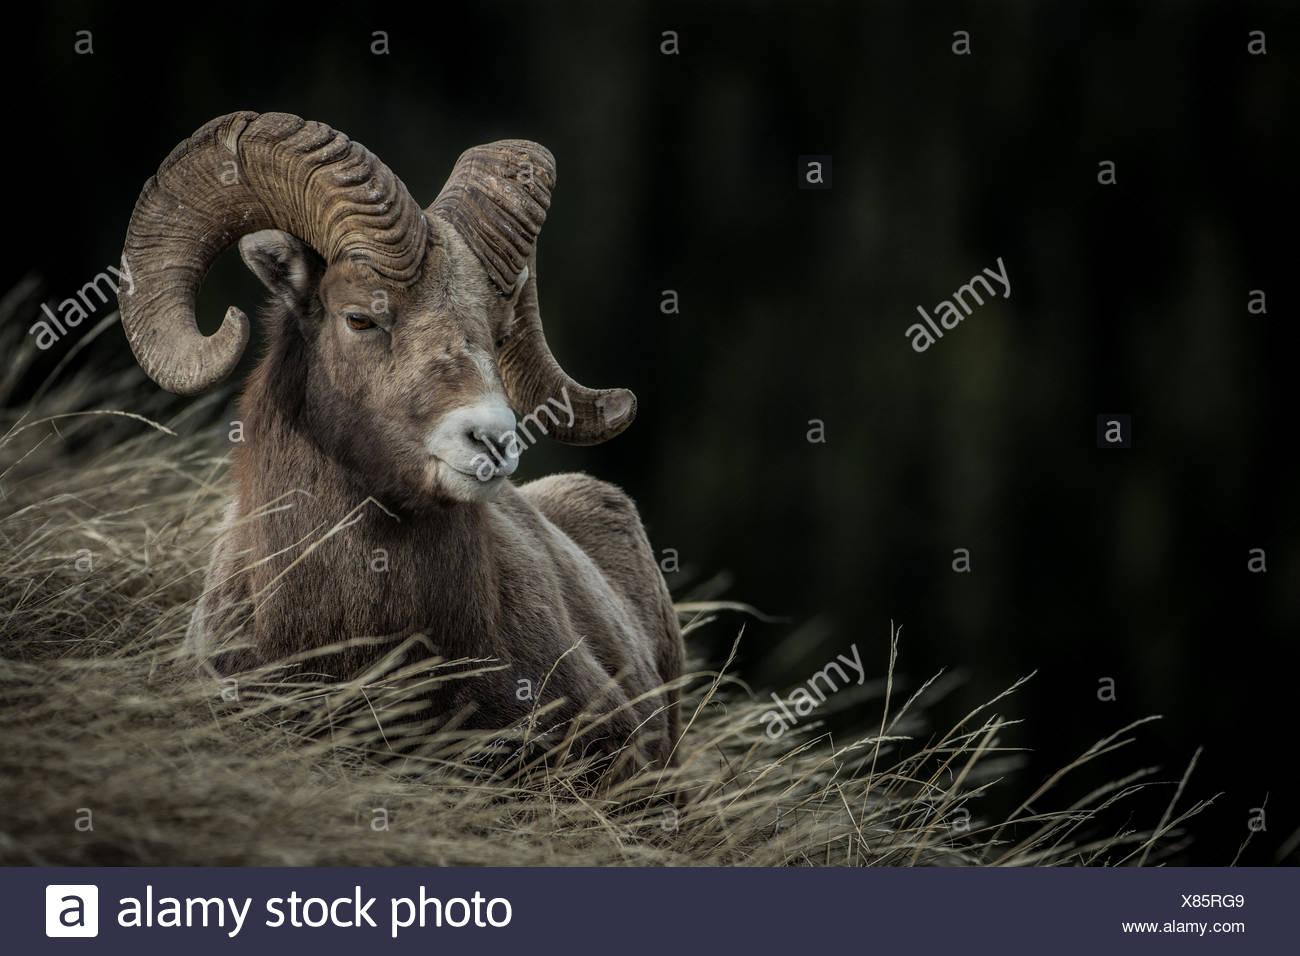 Ovis canadensis, bighorn sheep, ram bedded in Rockies, Alberta Canada - Stock Image